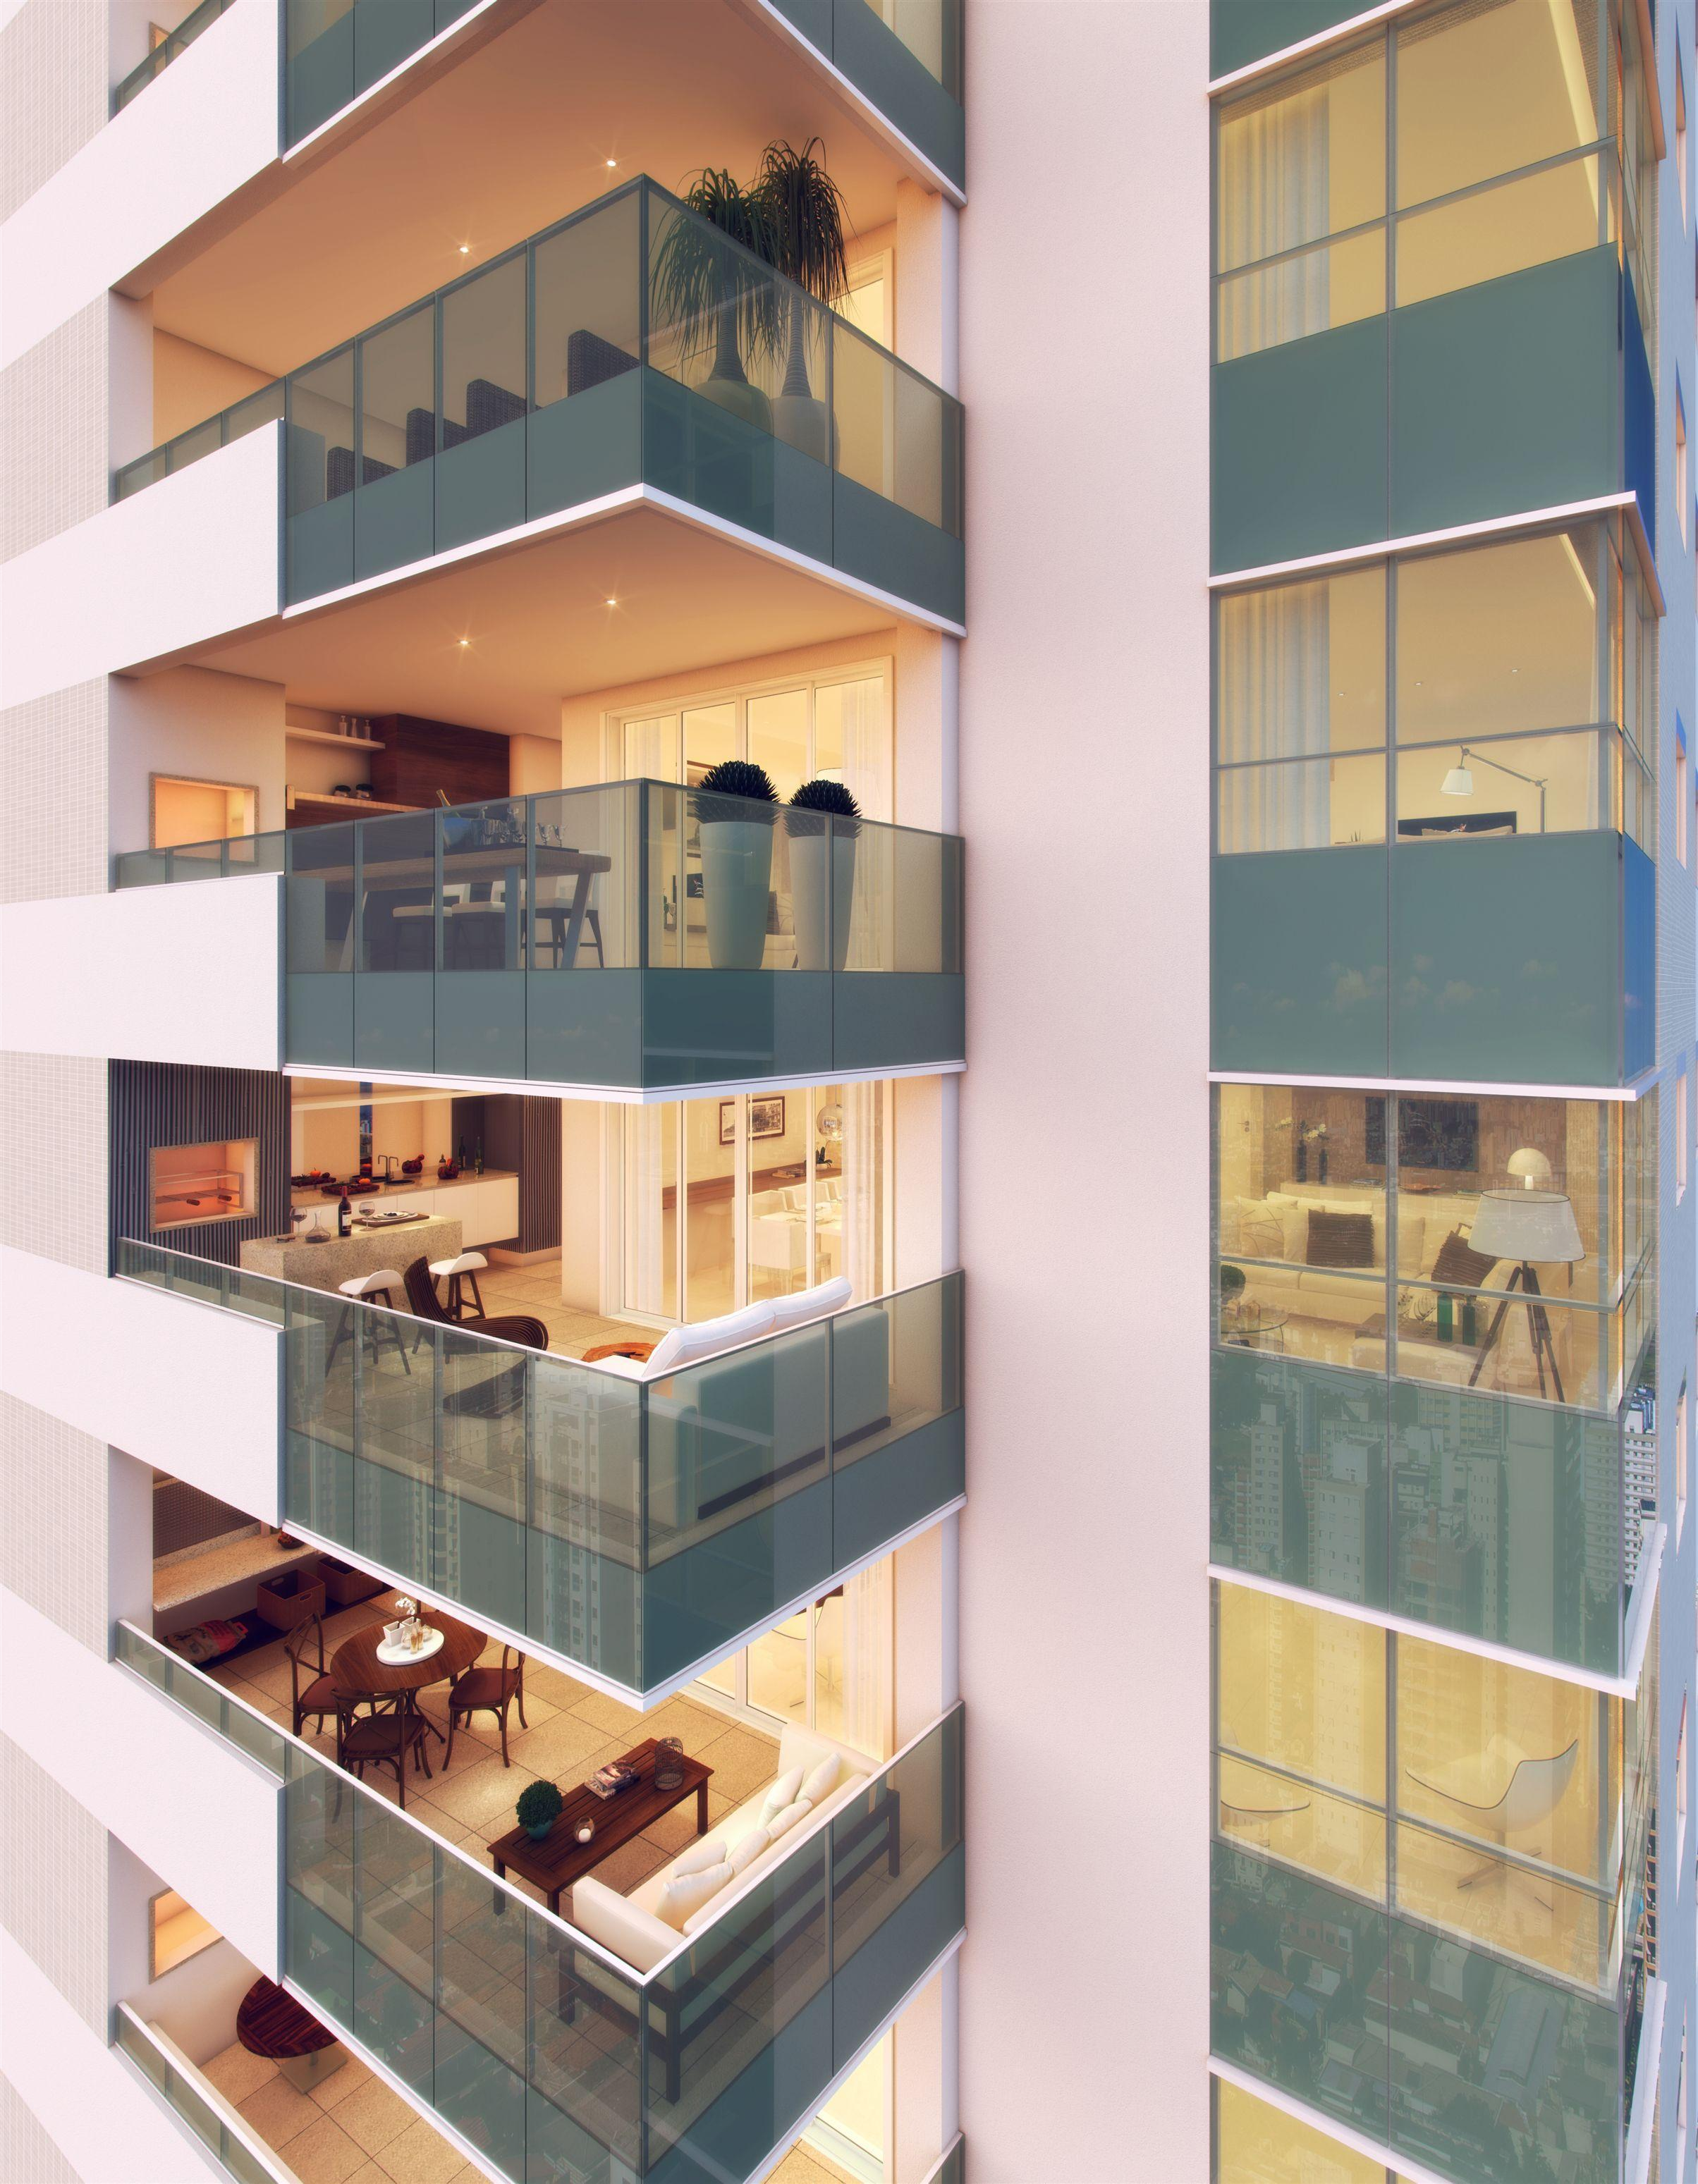 Fachada | Vetrino Brooklin by Cyrela – Apartamentono  Brooklin - São Paulo - São Paulo